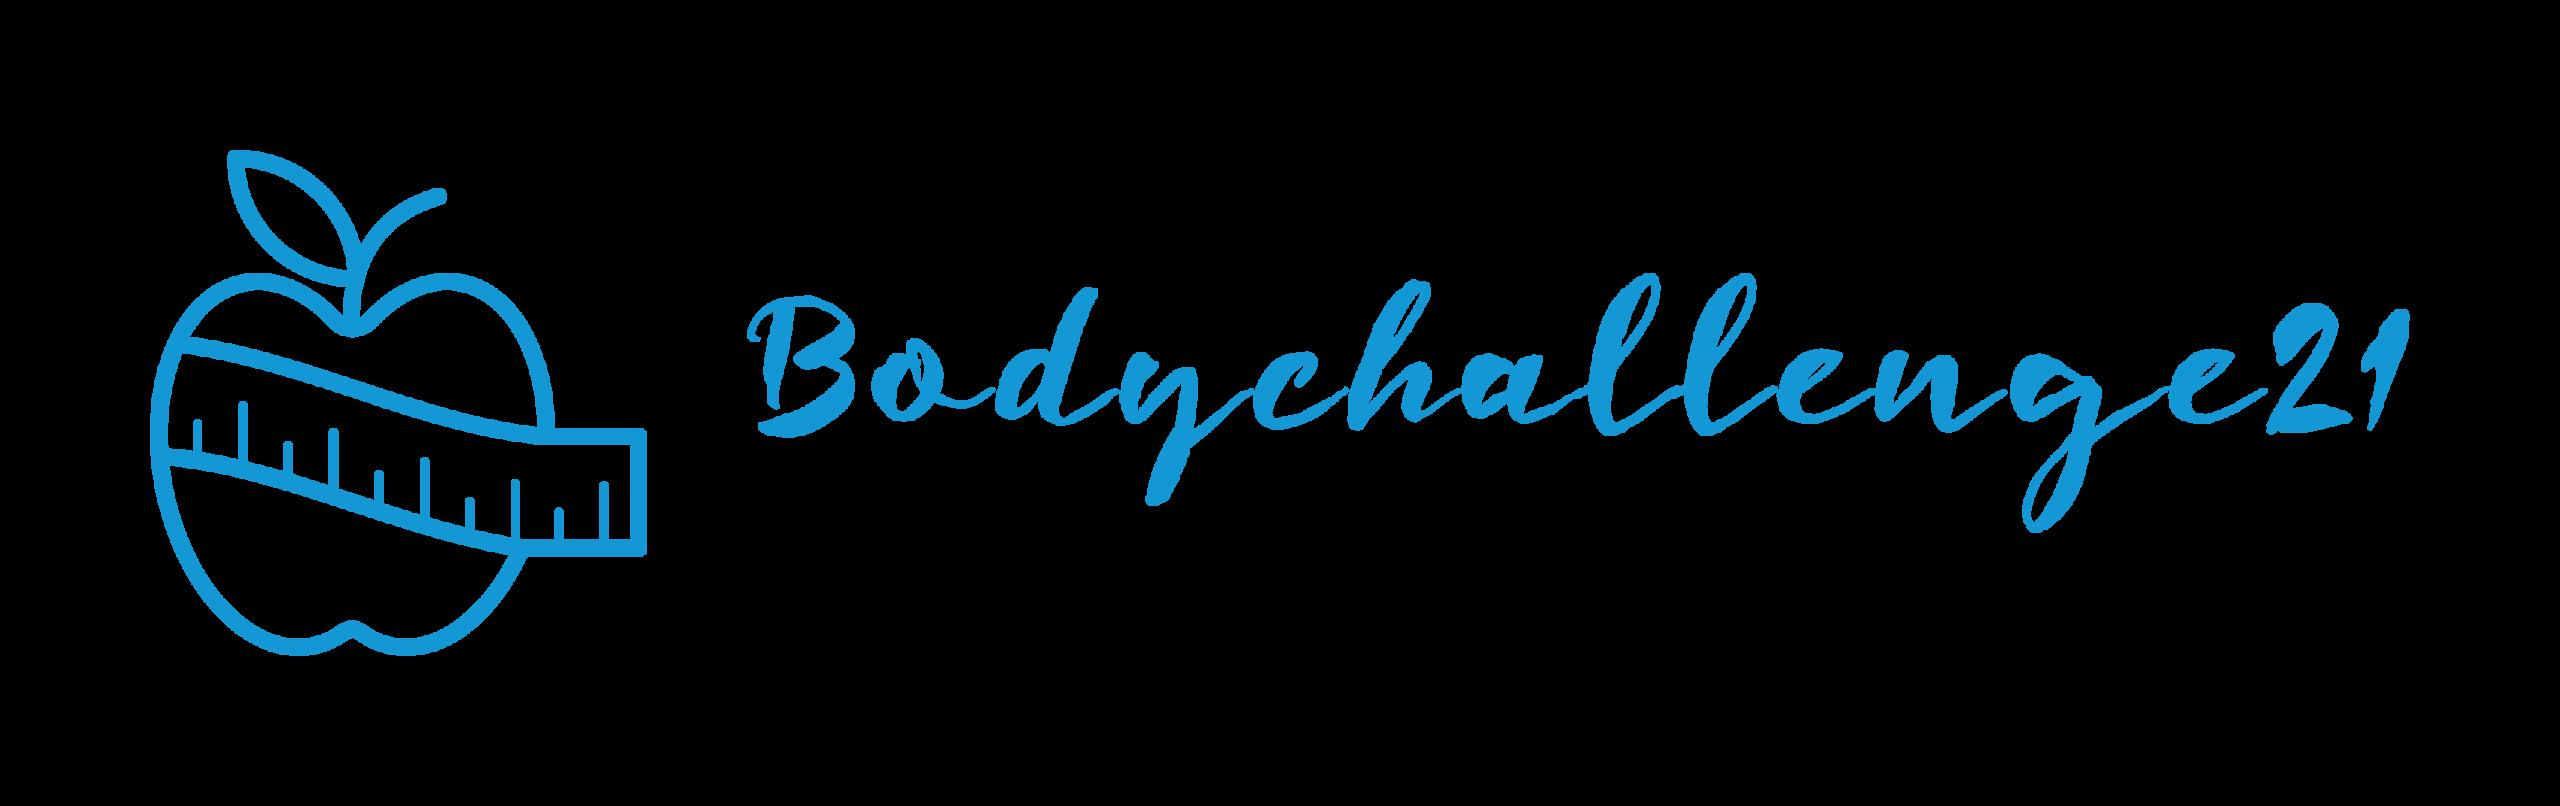 BodyChallenge 21